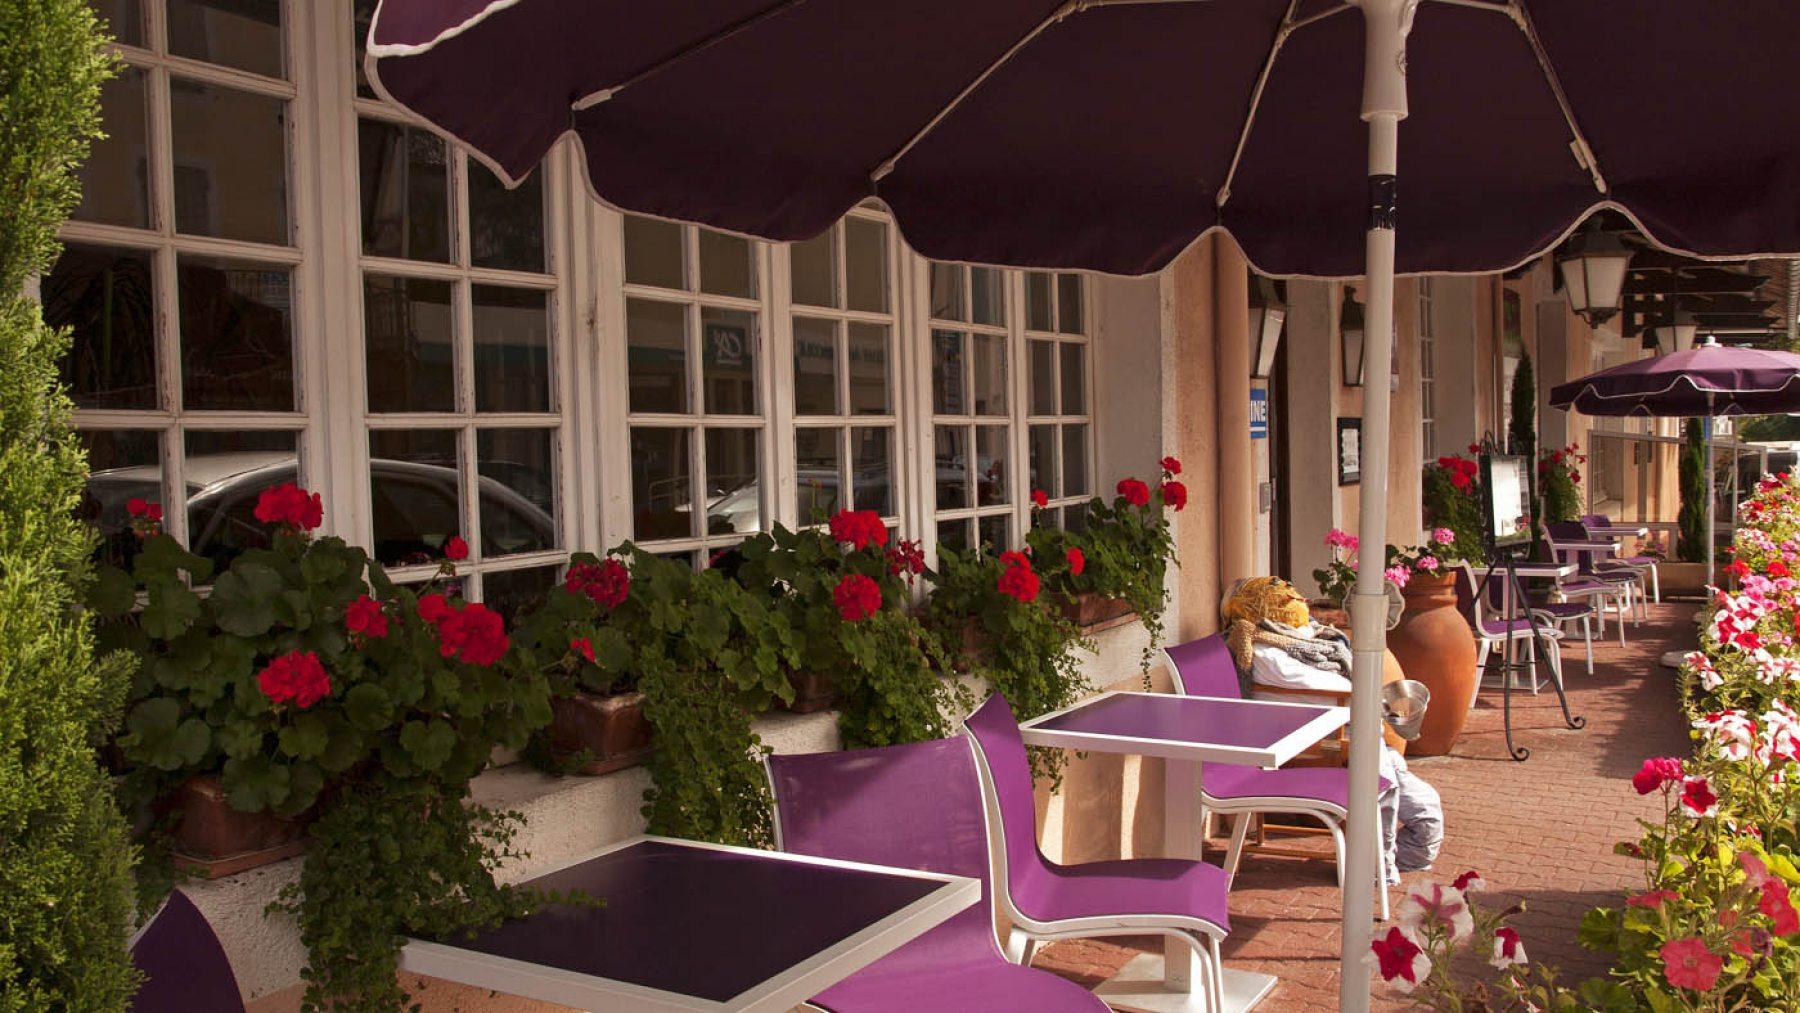 Hôtel Restaurant des Négociants